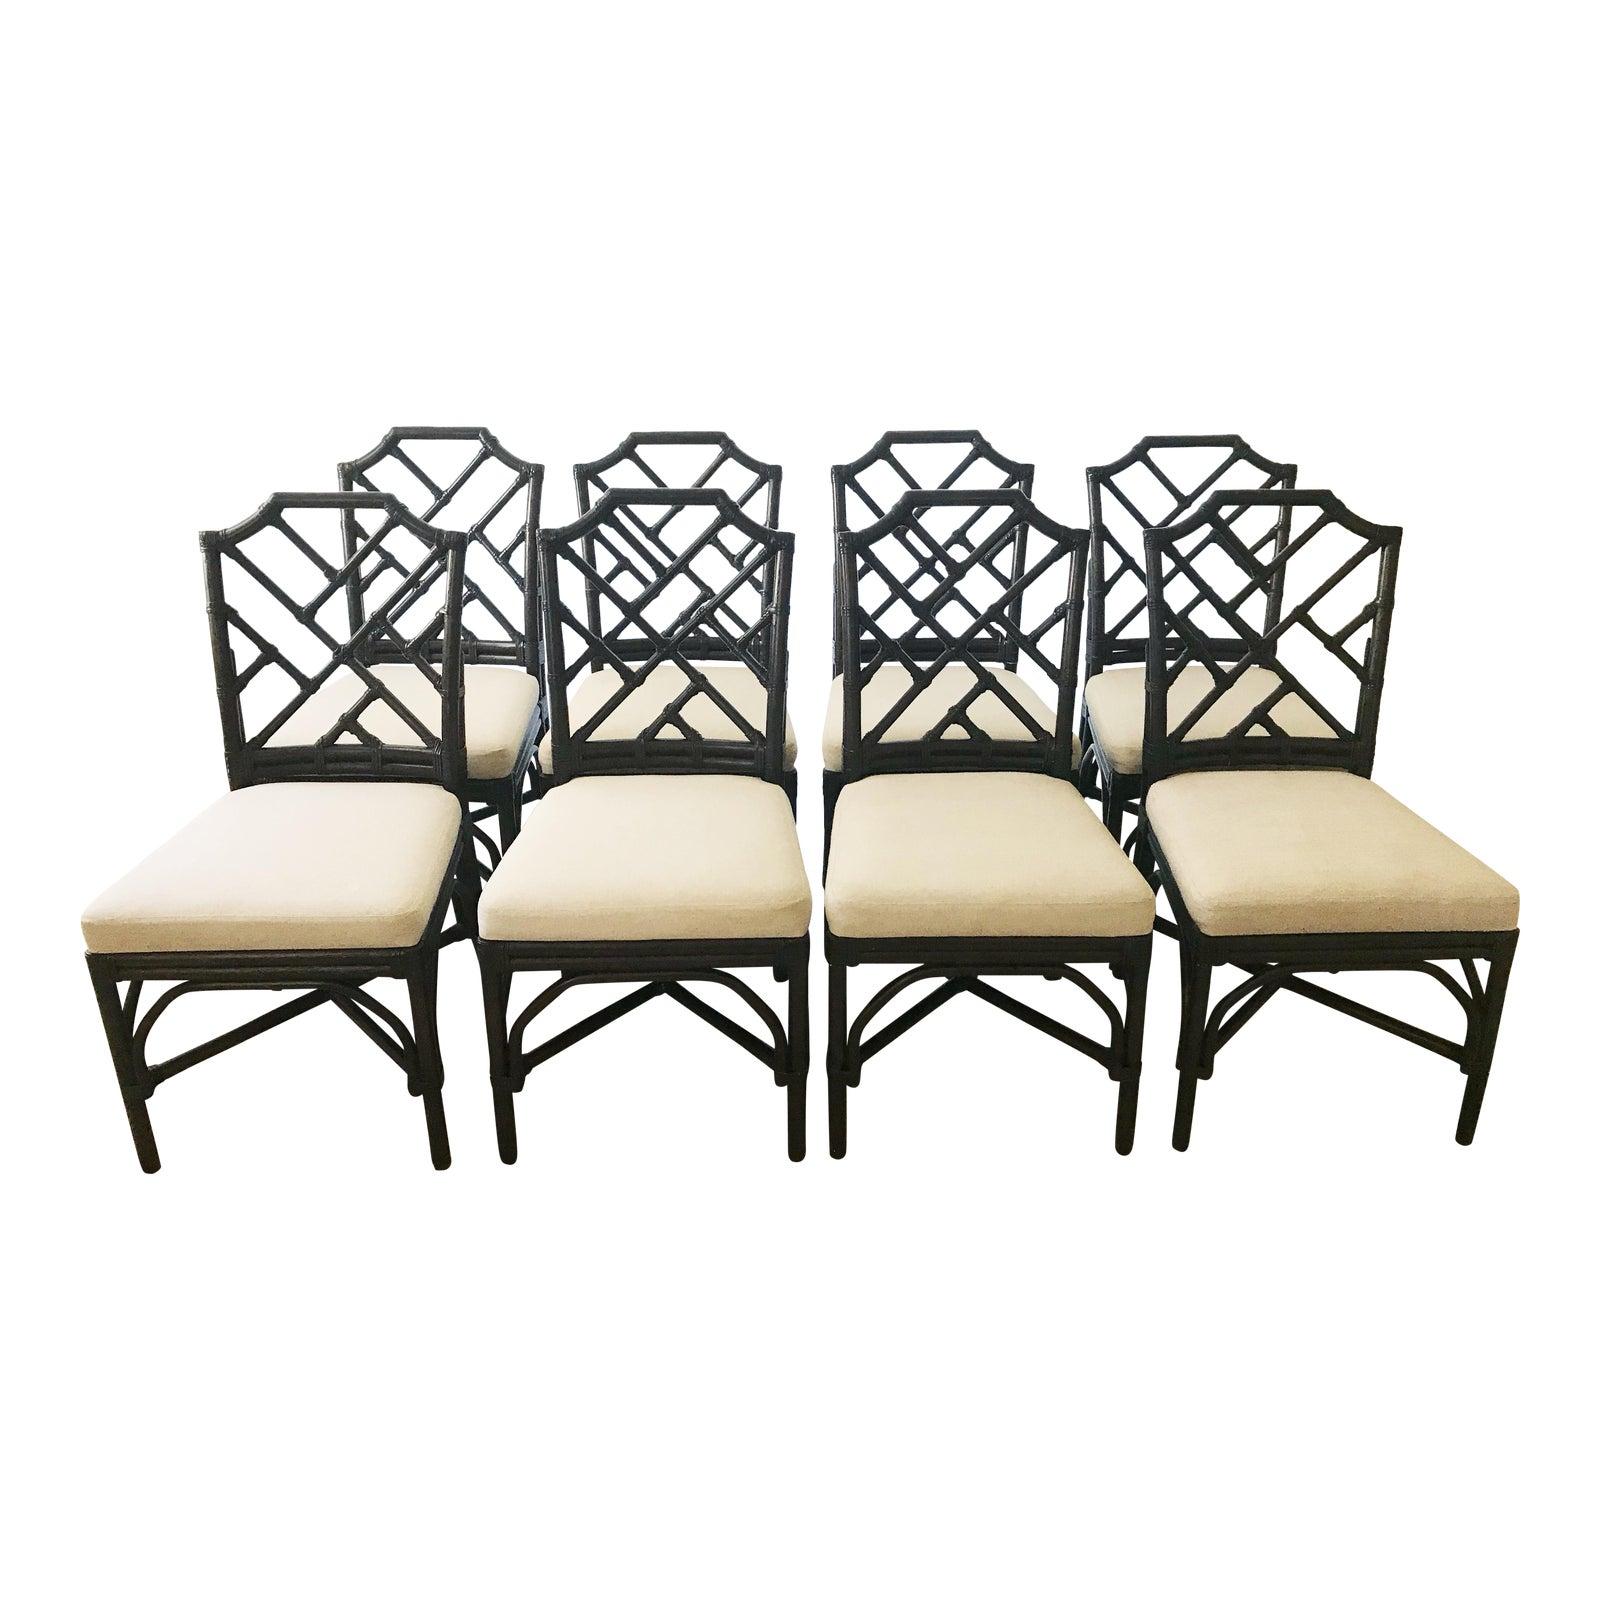 Phenomenal Rattan Palecek Chippendale Dining Chairs Set Of 8 Theyellowbook Wood Chair Design Ideas Theyellowbookinfo